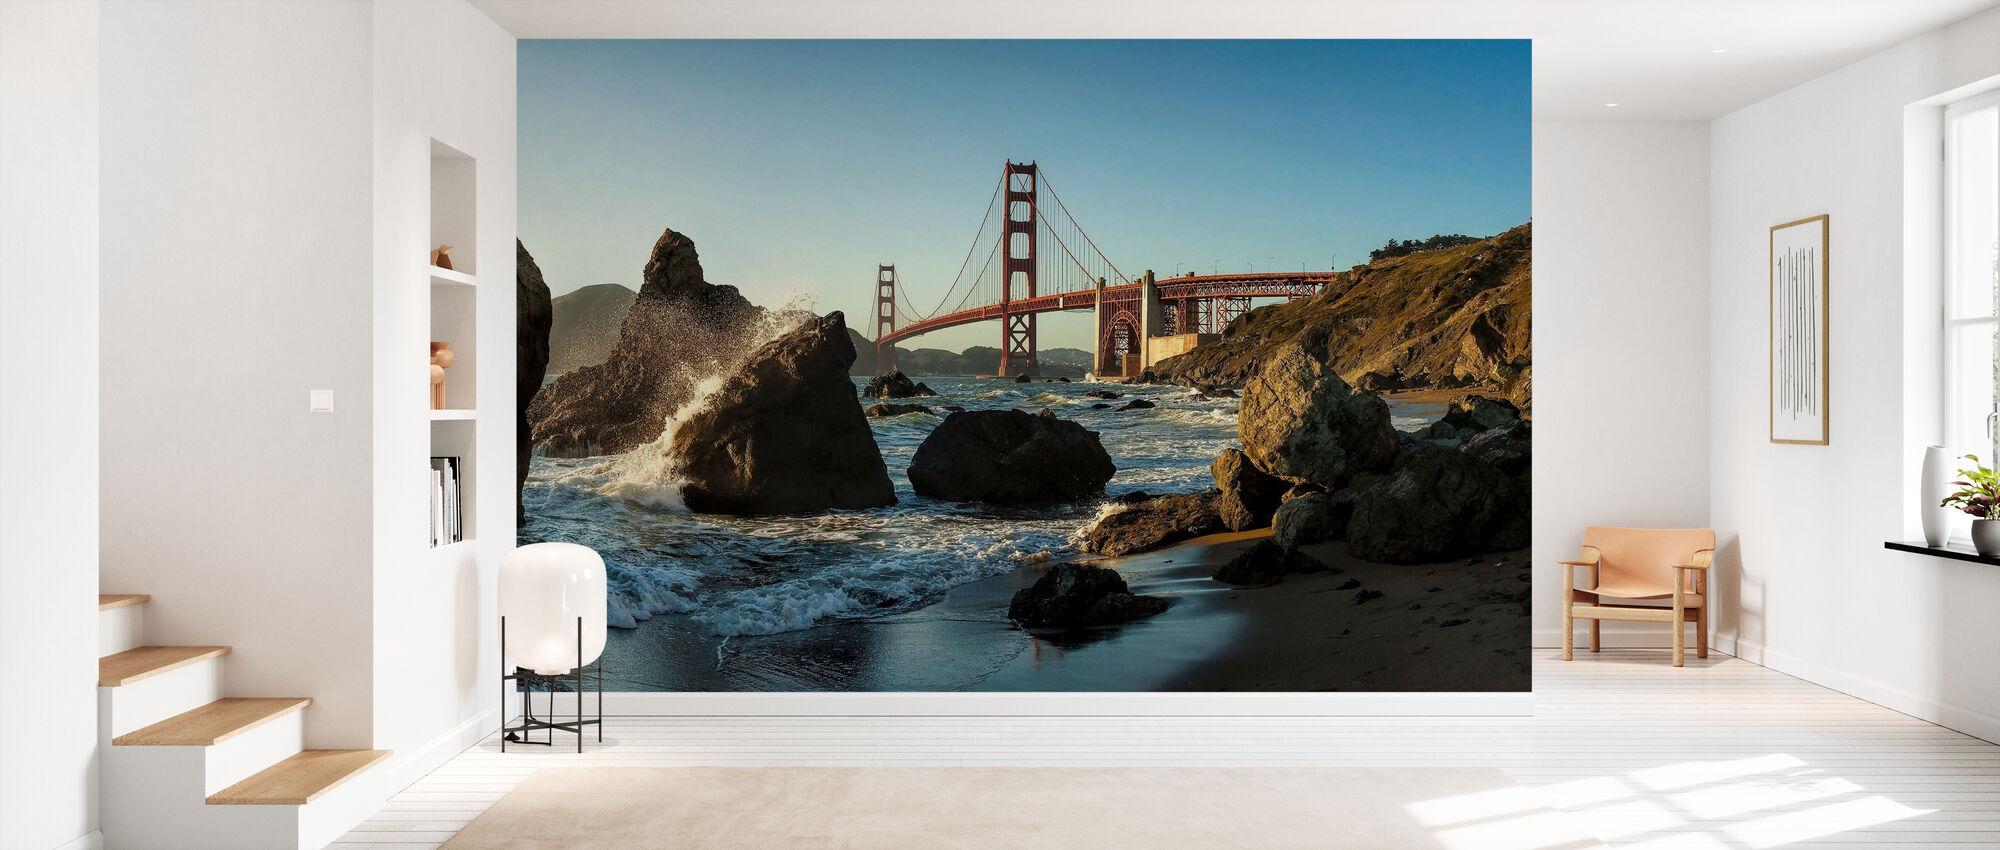 Rocks and the Golden Gate - Wallpaper - Hallway